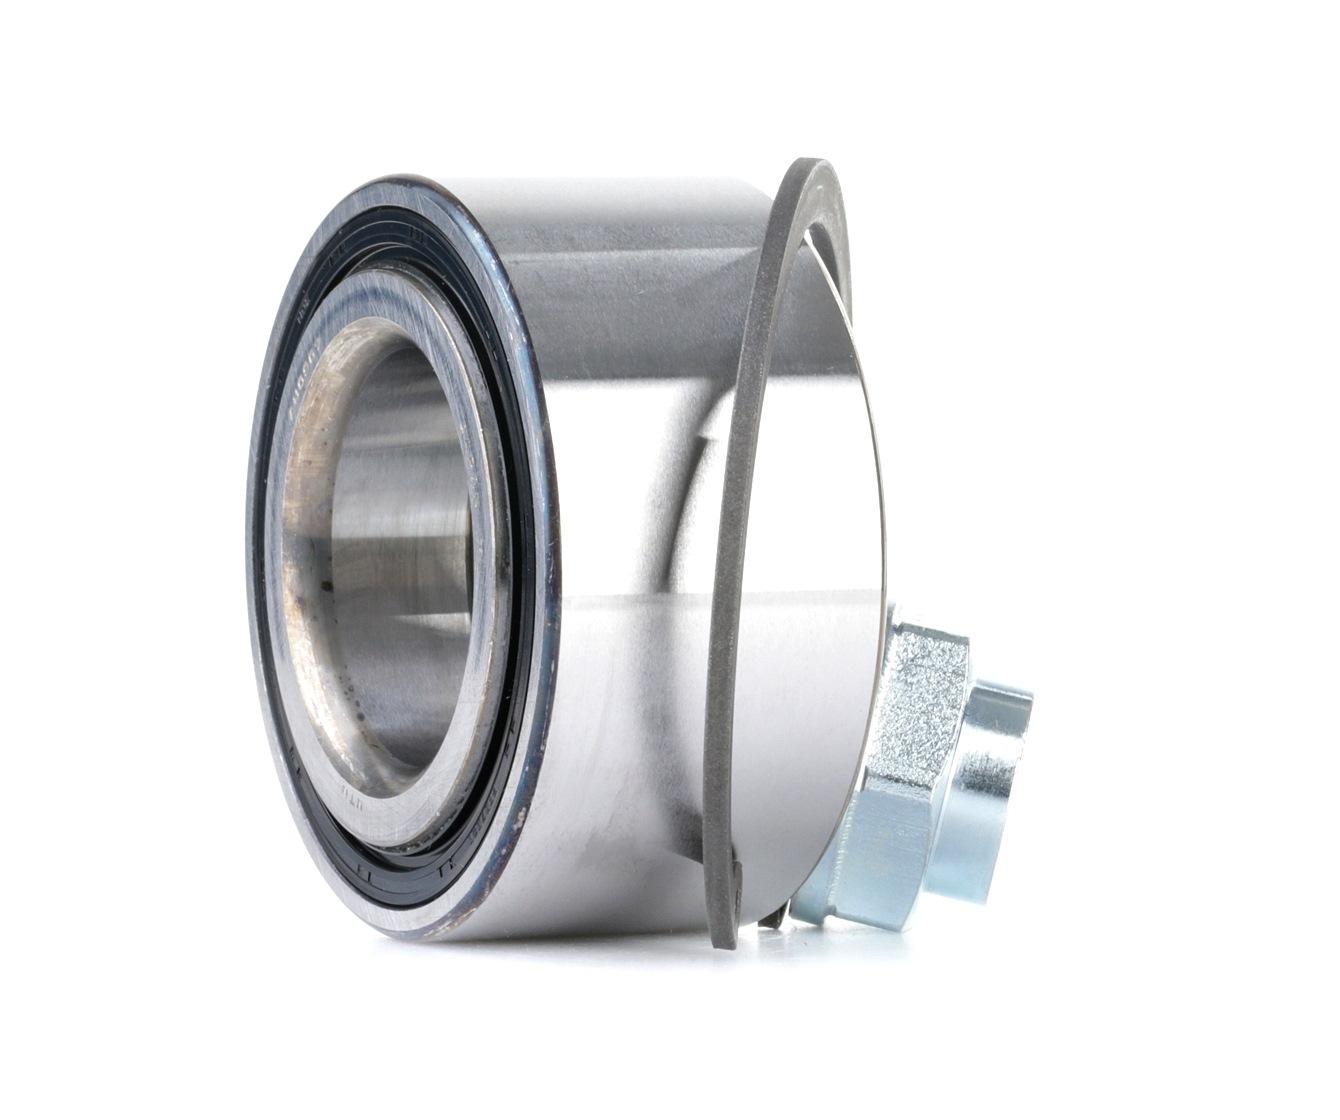 Wheel Bearing SNR R174.34 rating